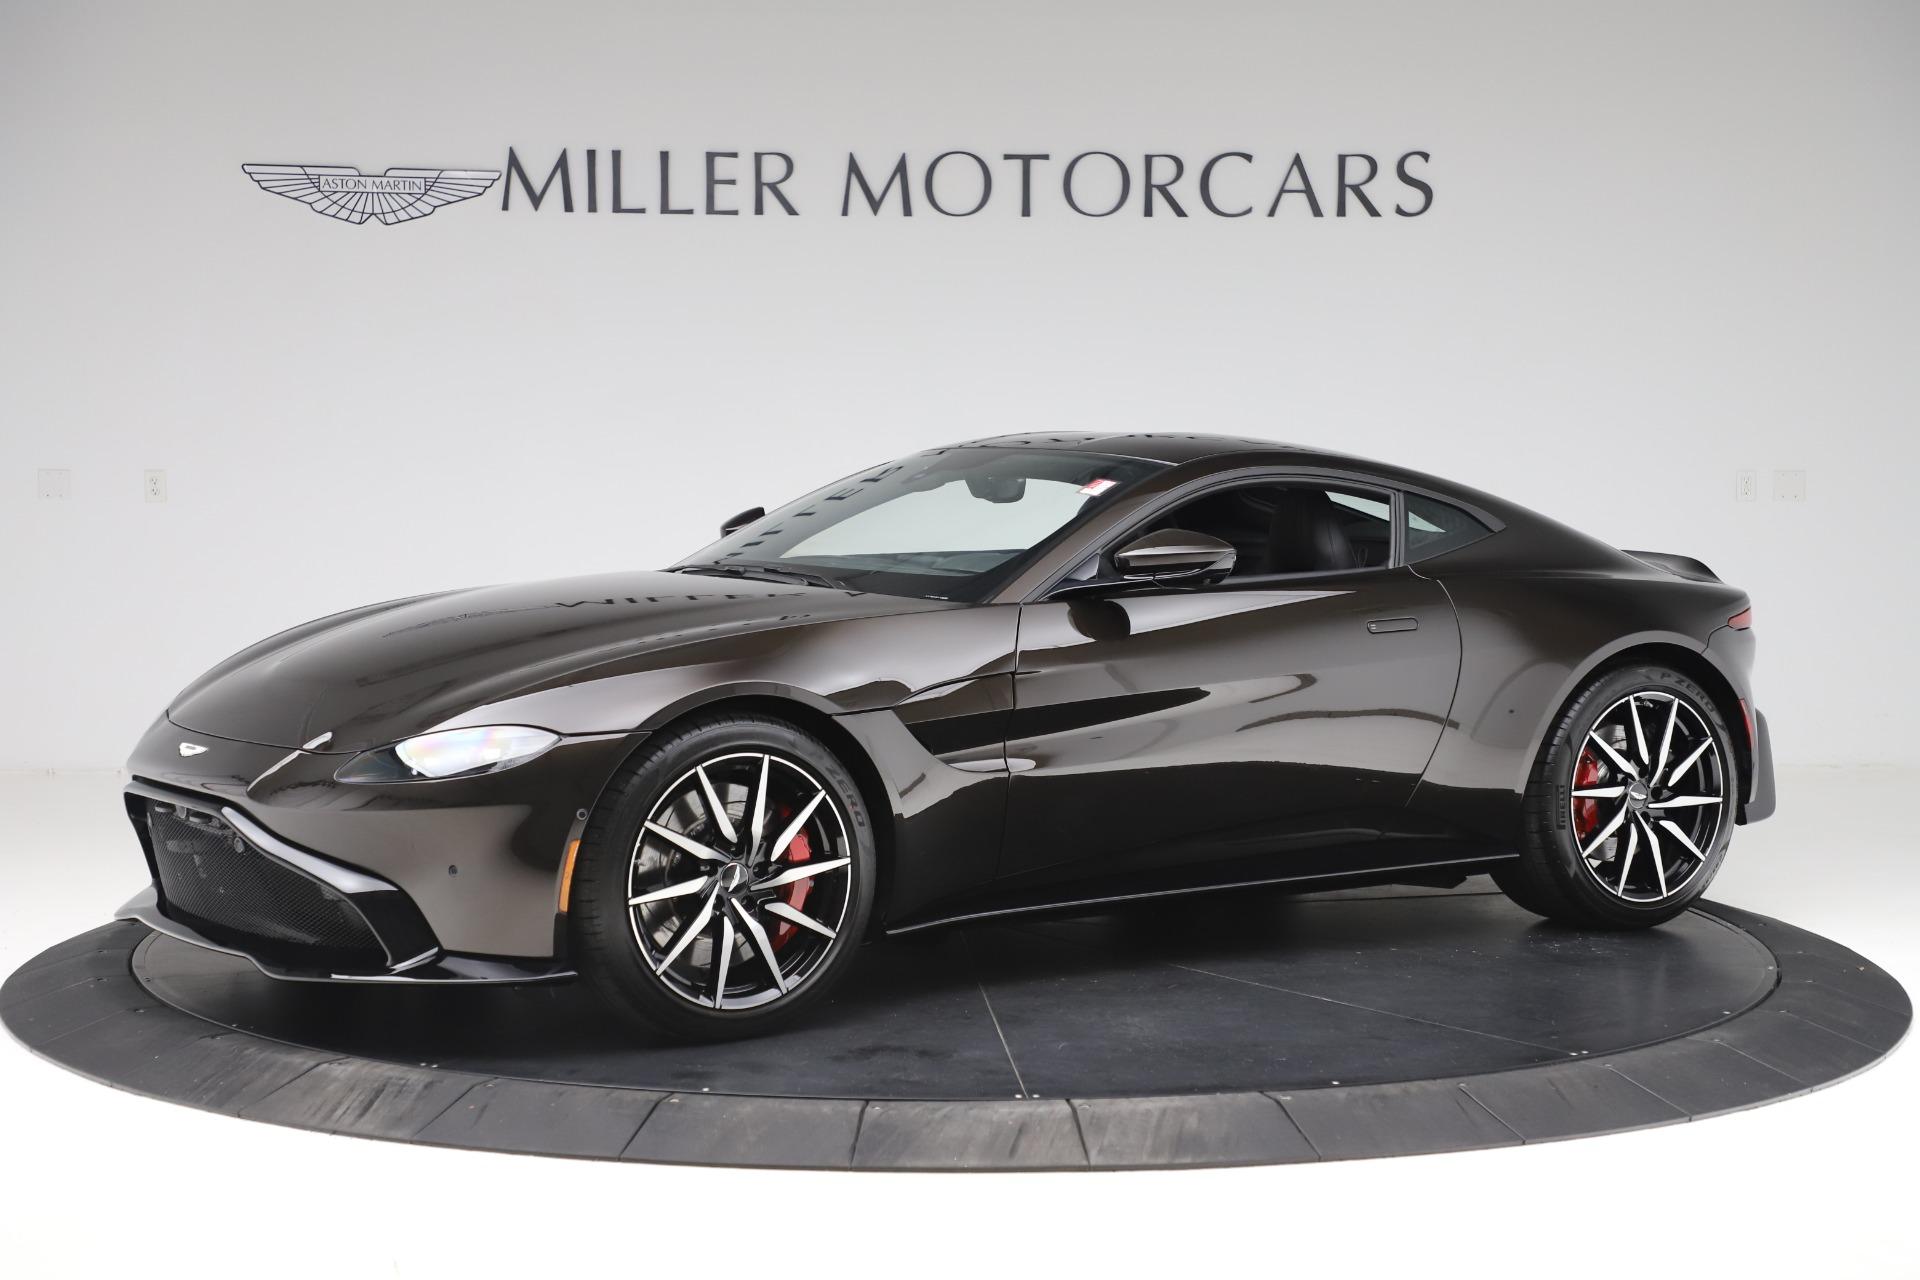 New 2020 Aston Martin Vantage for sale $184,787 at Maserati of Greenwich in Greenwich CT 06830 1